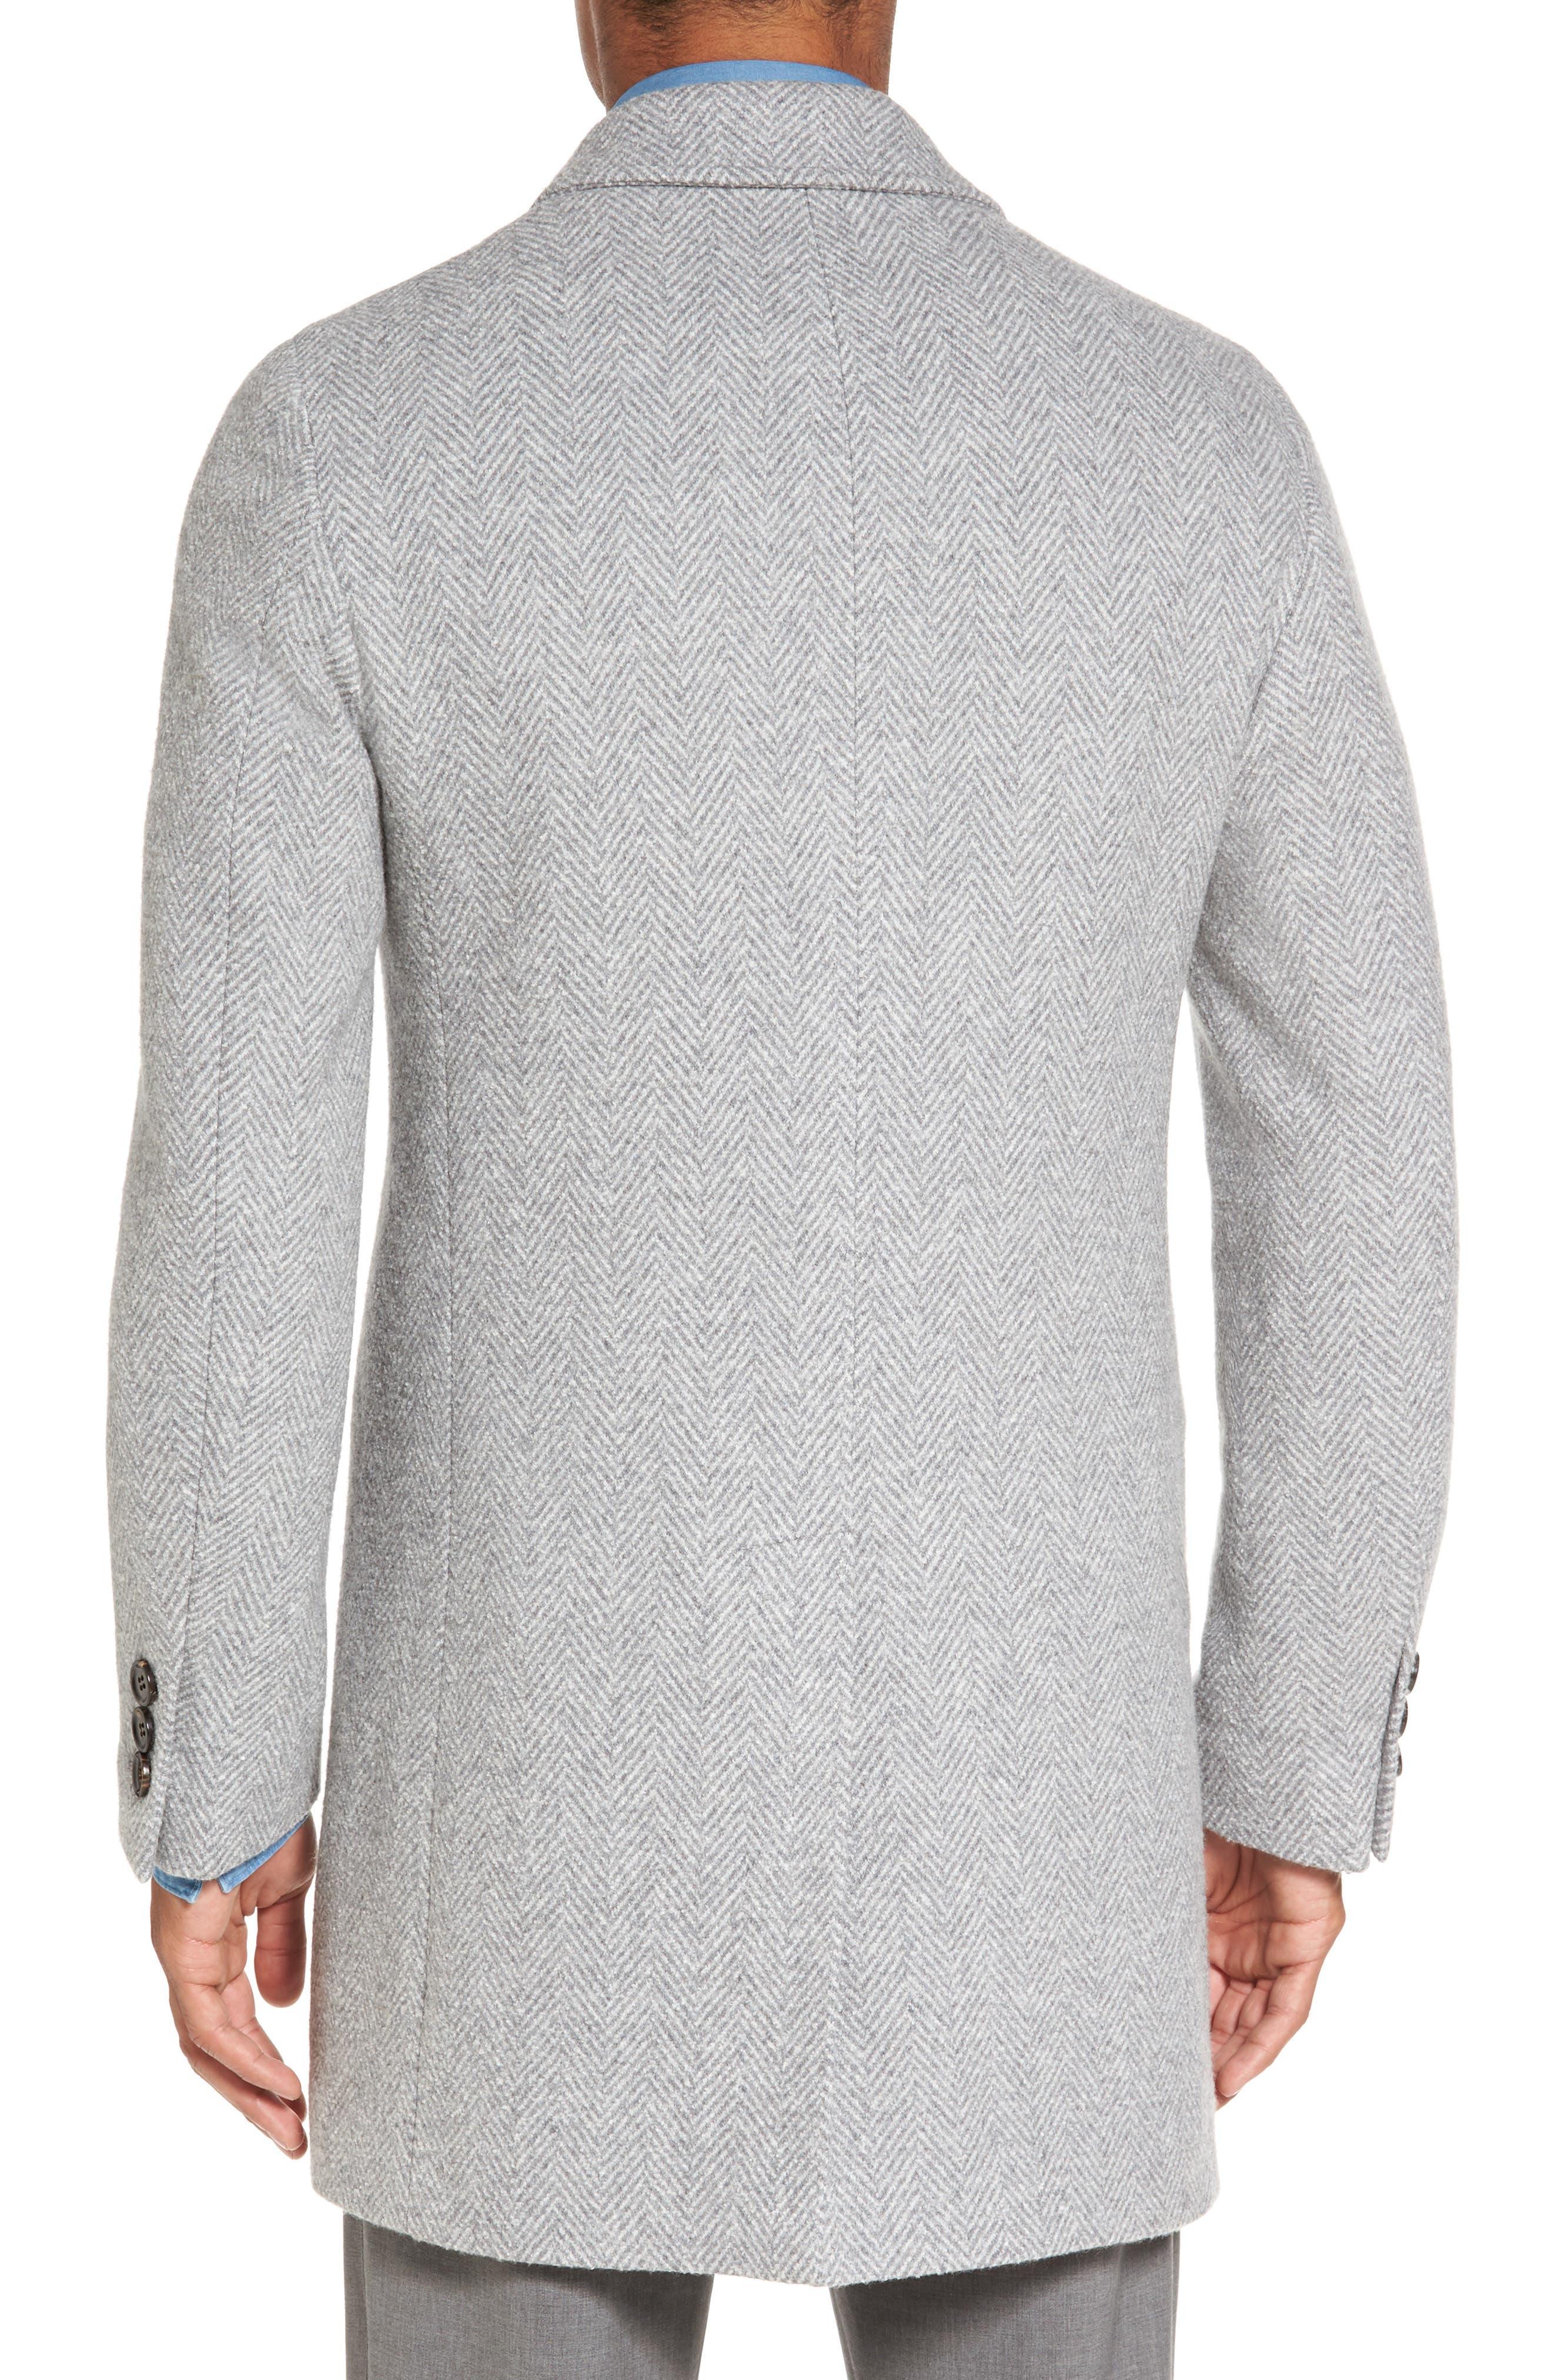 Alternate Image 2  - Eleventy Herringbone Wool Blend Overcoat